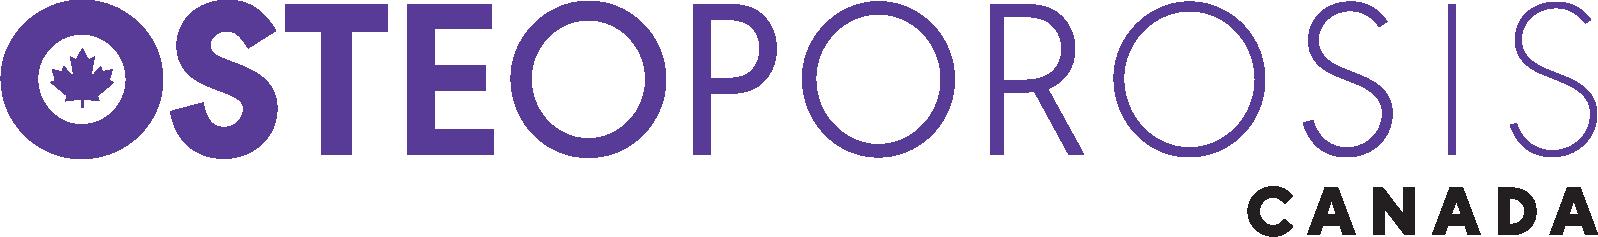 OC-PURPLE-TEXT-CANADA